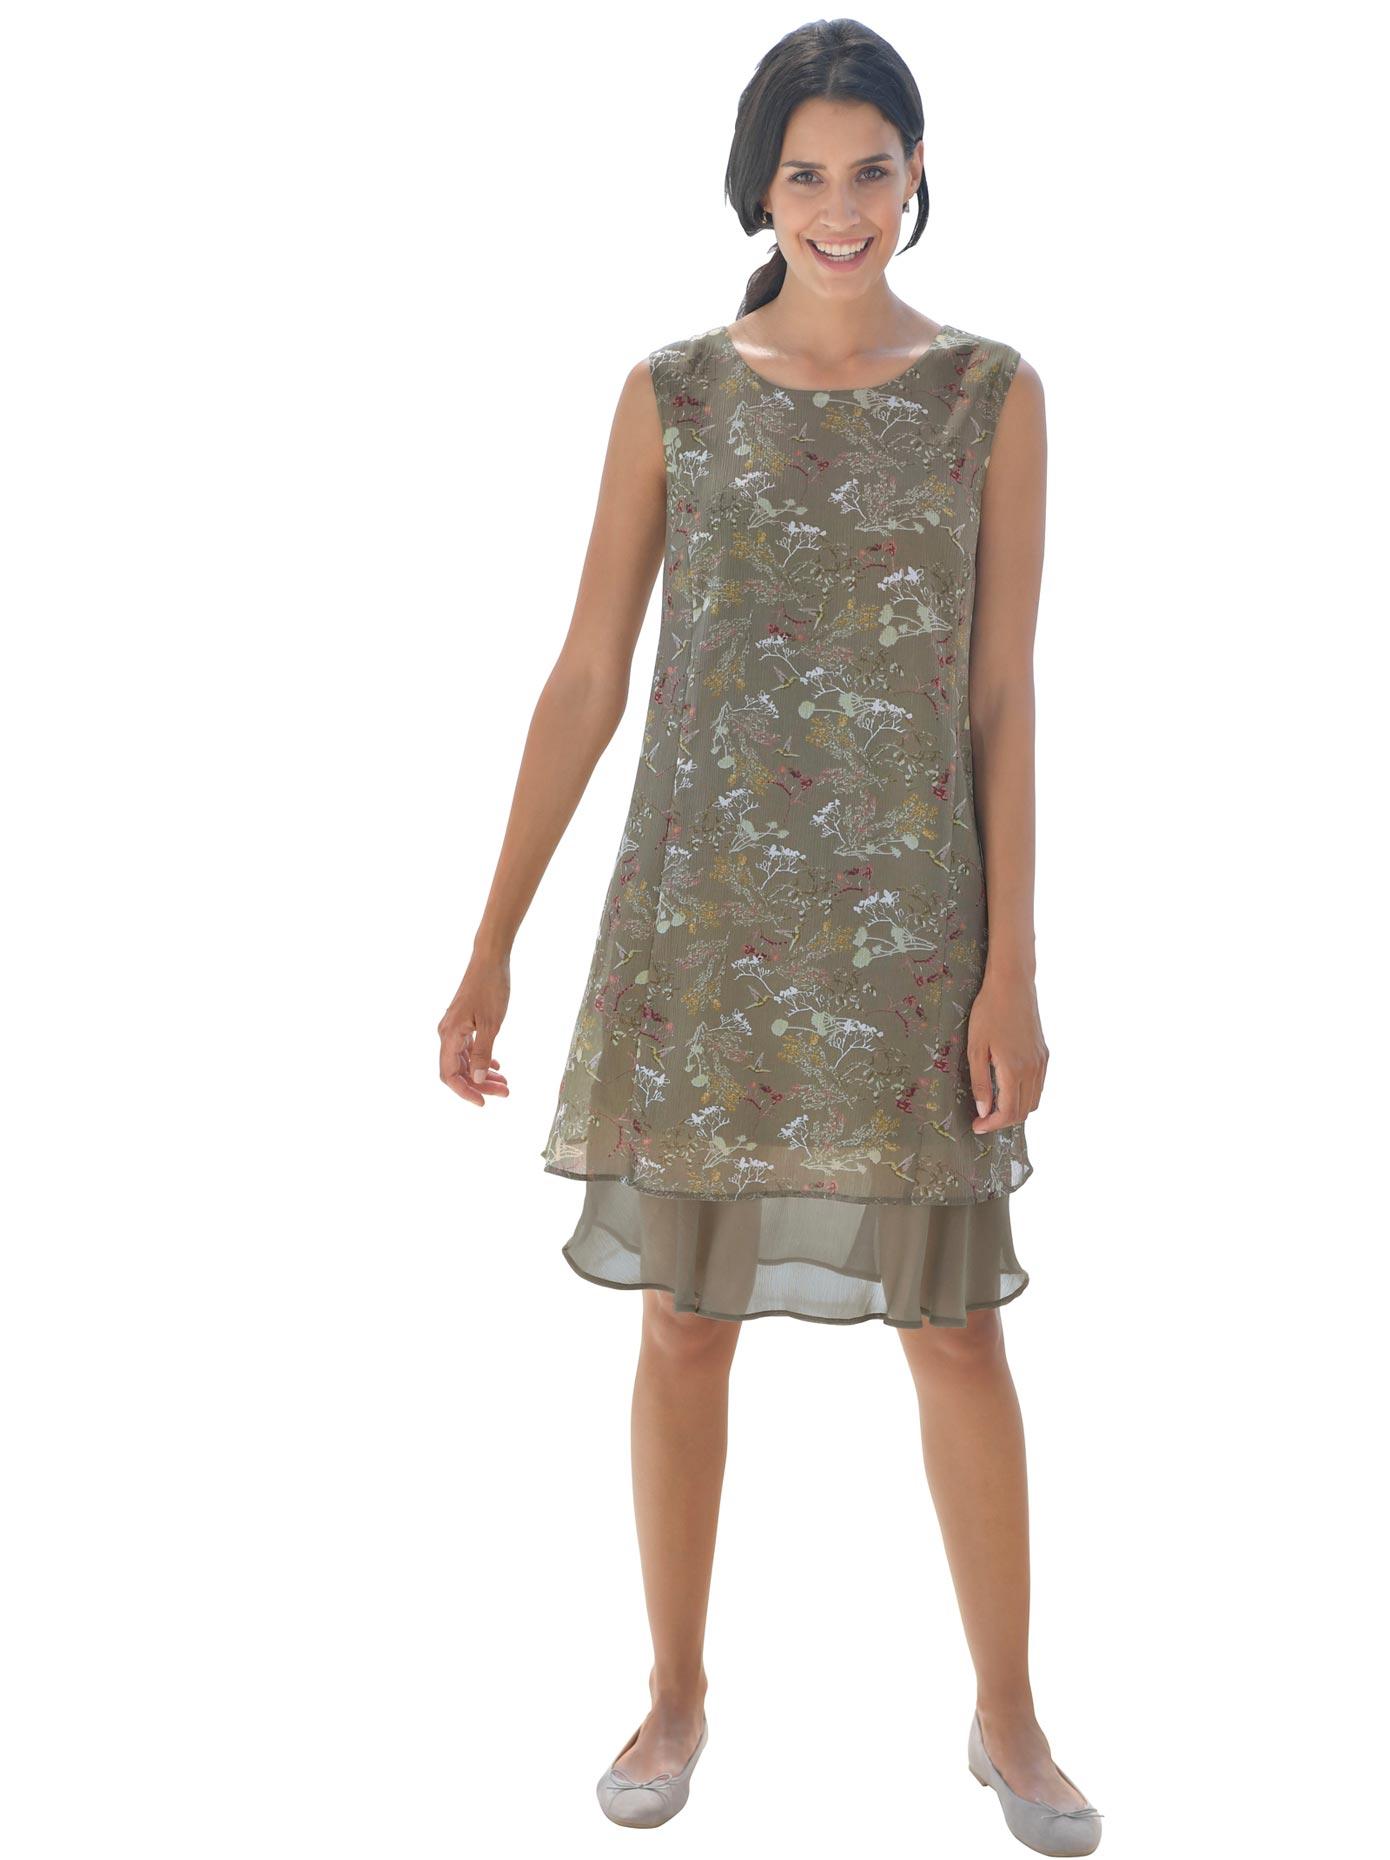 création L Kleid in leicht crinkeliger Qualität